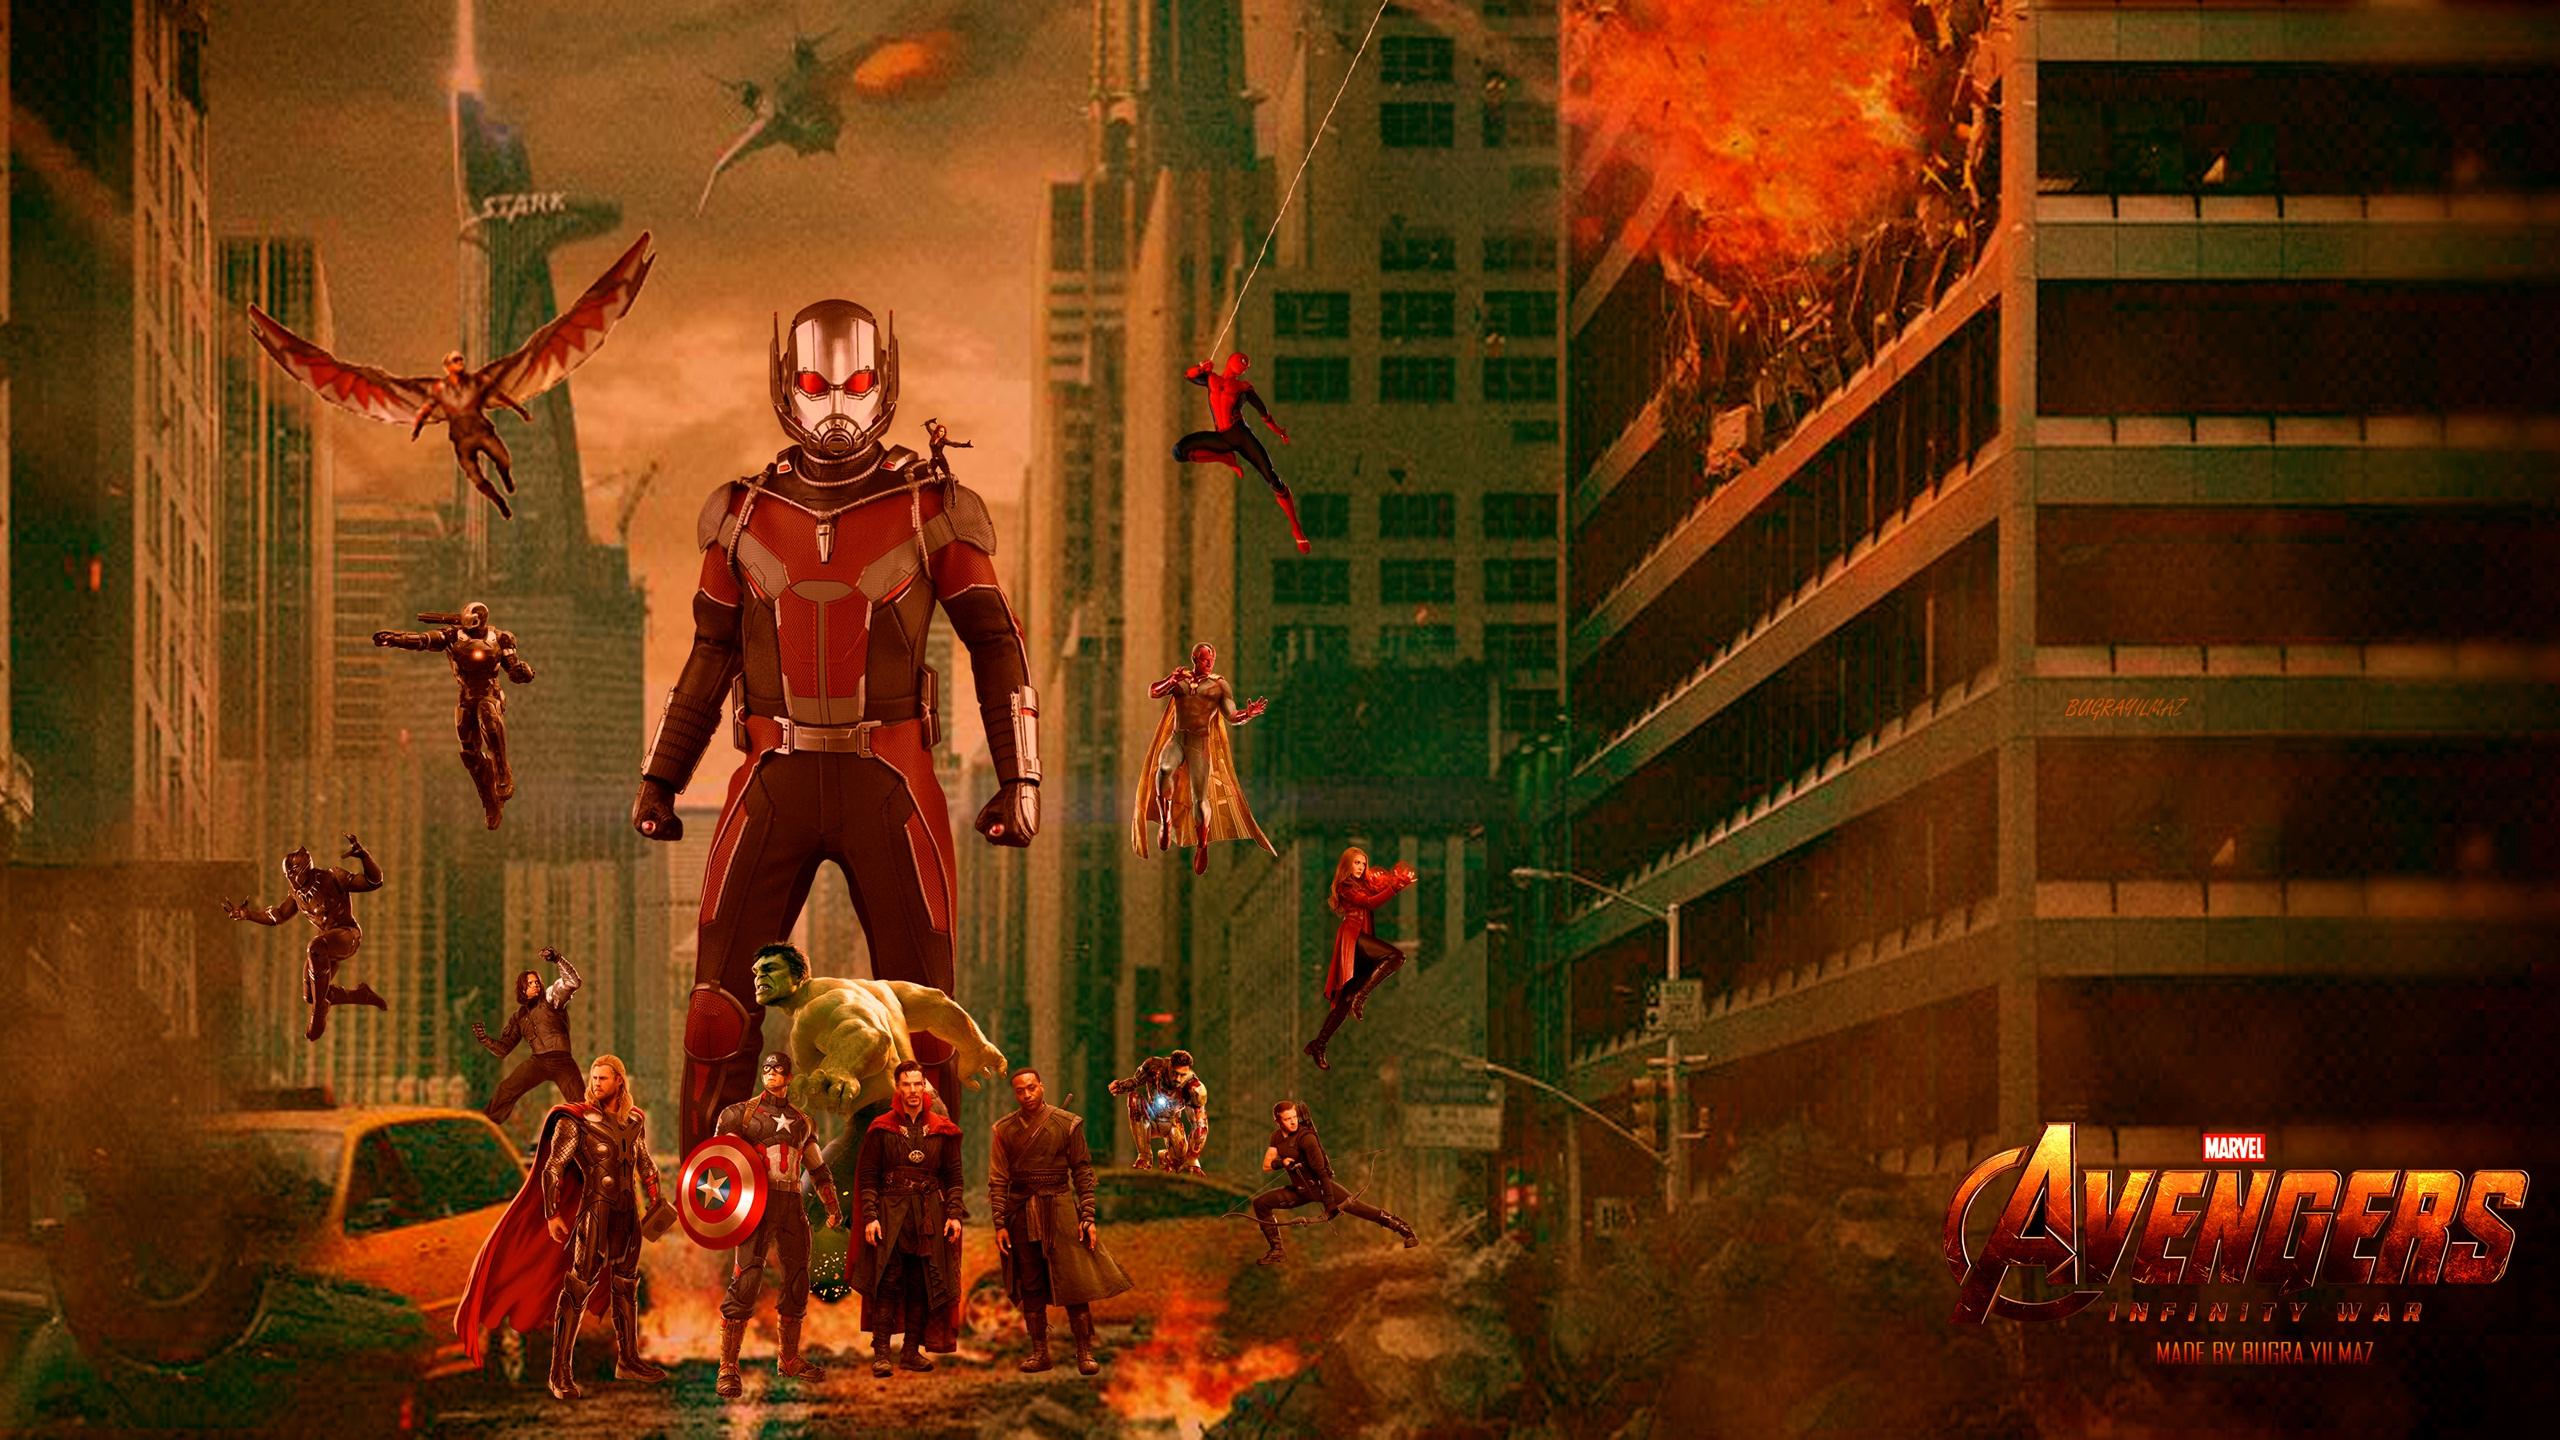 Avengers Infinity War Wallpaper Hd 307740 Hd Wallpaper